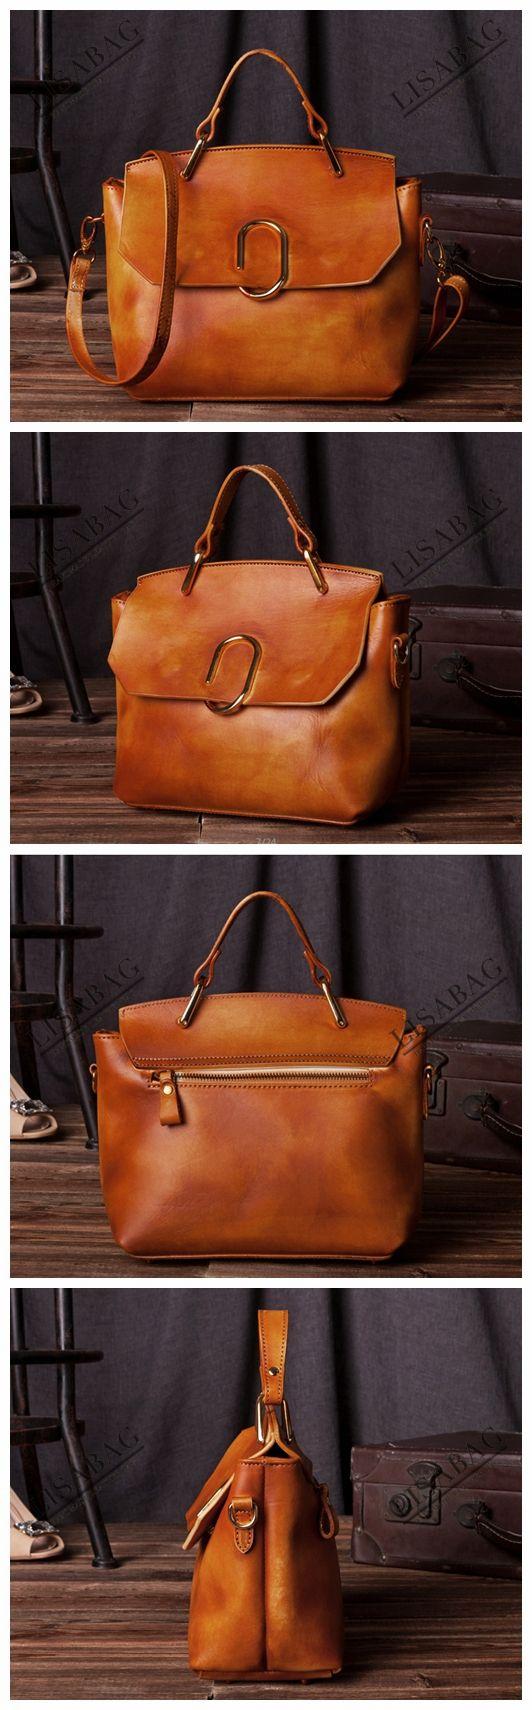 Handcrafted Women's Fashion Leather Handbag Messenger Bag Small Satchel in Shiny Brown C205--LISABAG